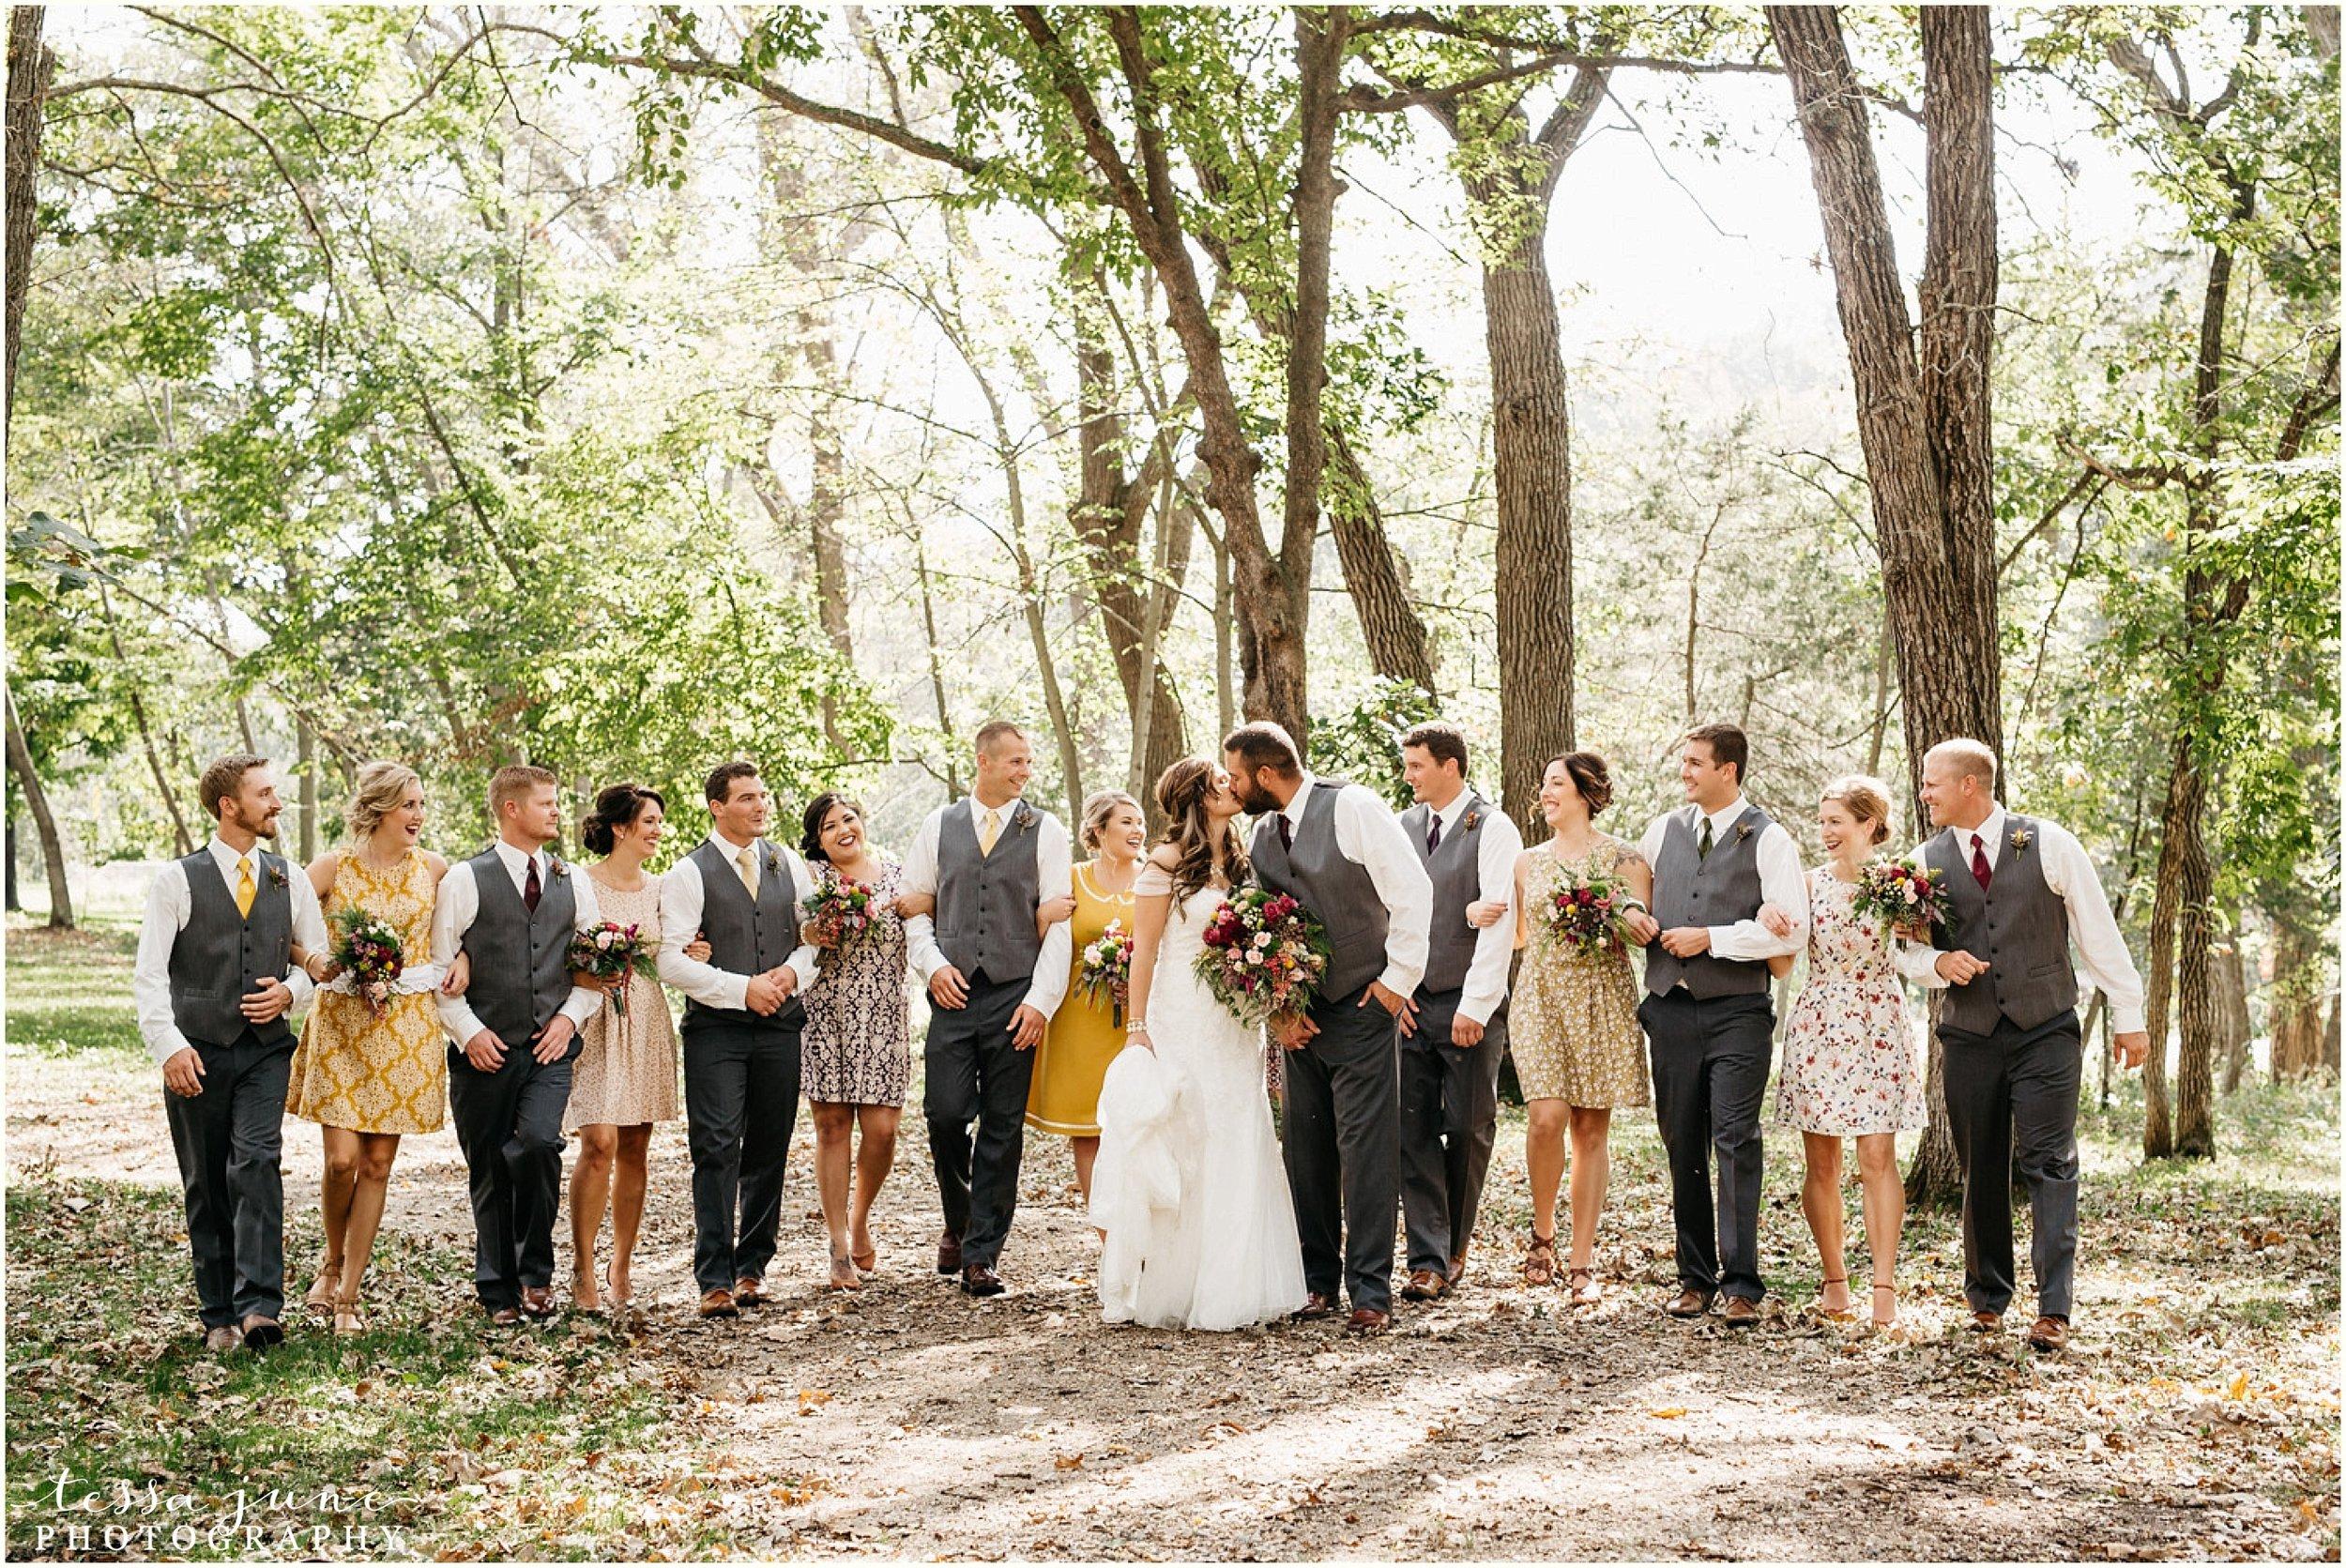 bohemian-minnesota-wedding-mismatched-bridesmaid-dresses-waterfall-st-cloud-tessa-june-photography-90.jpg